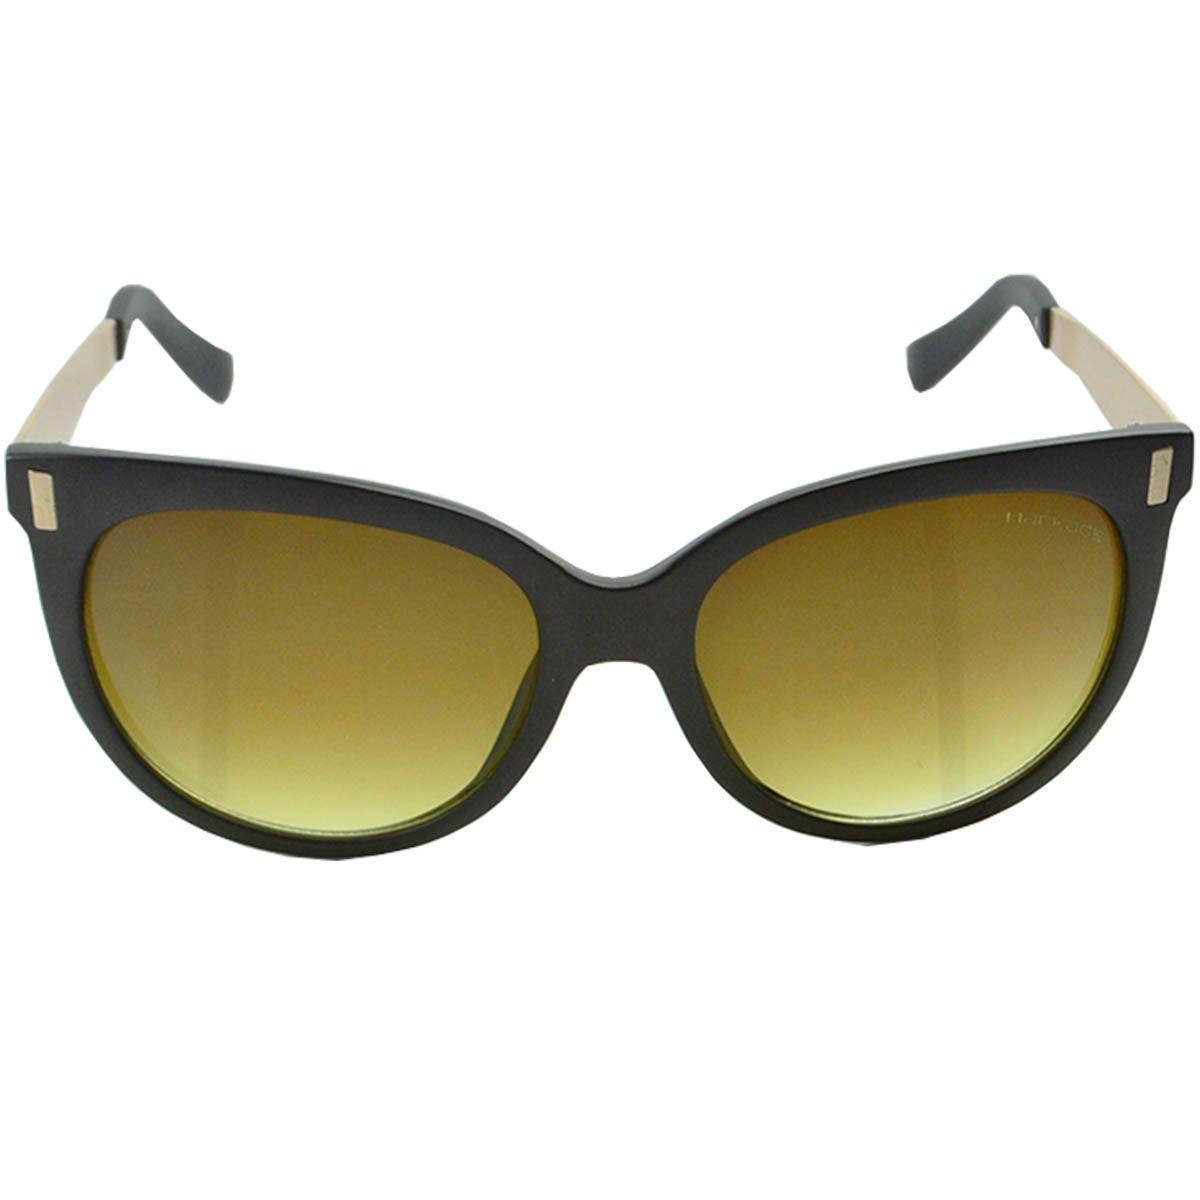 Óculos de Sol Feminino Mackage MK2127M Marrom